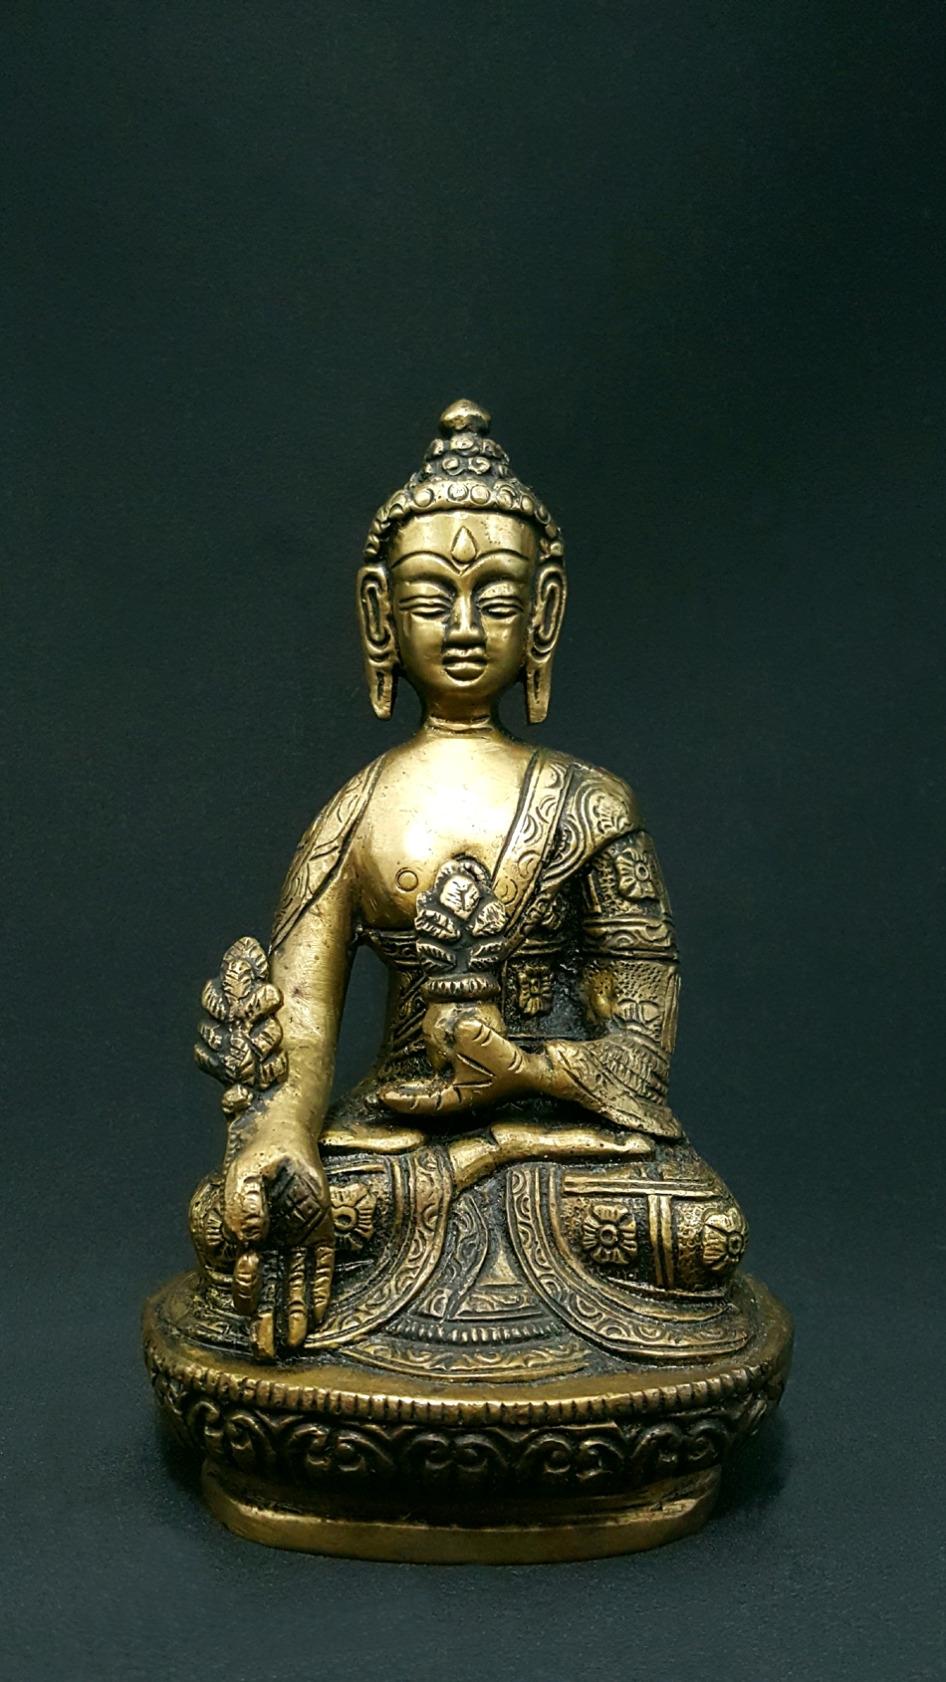 Buddha medecine lotus